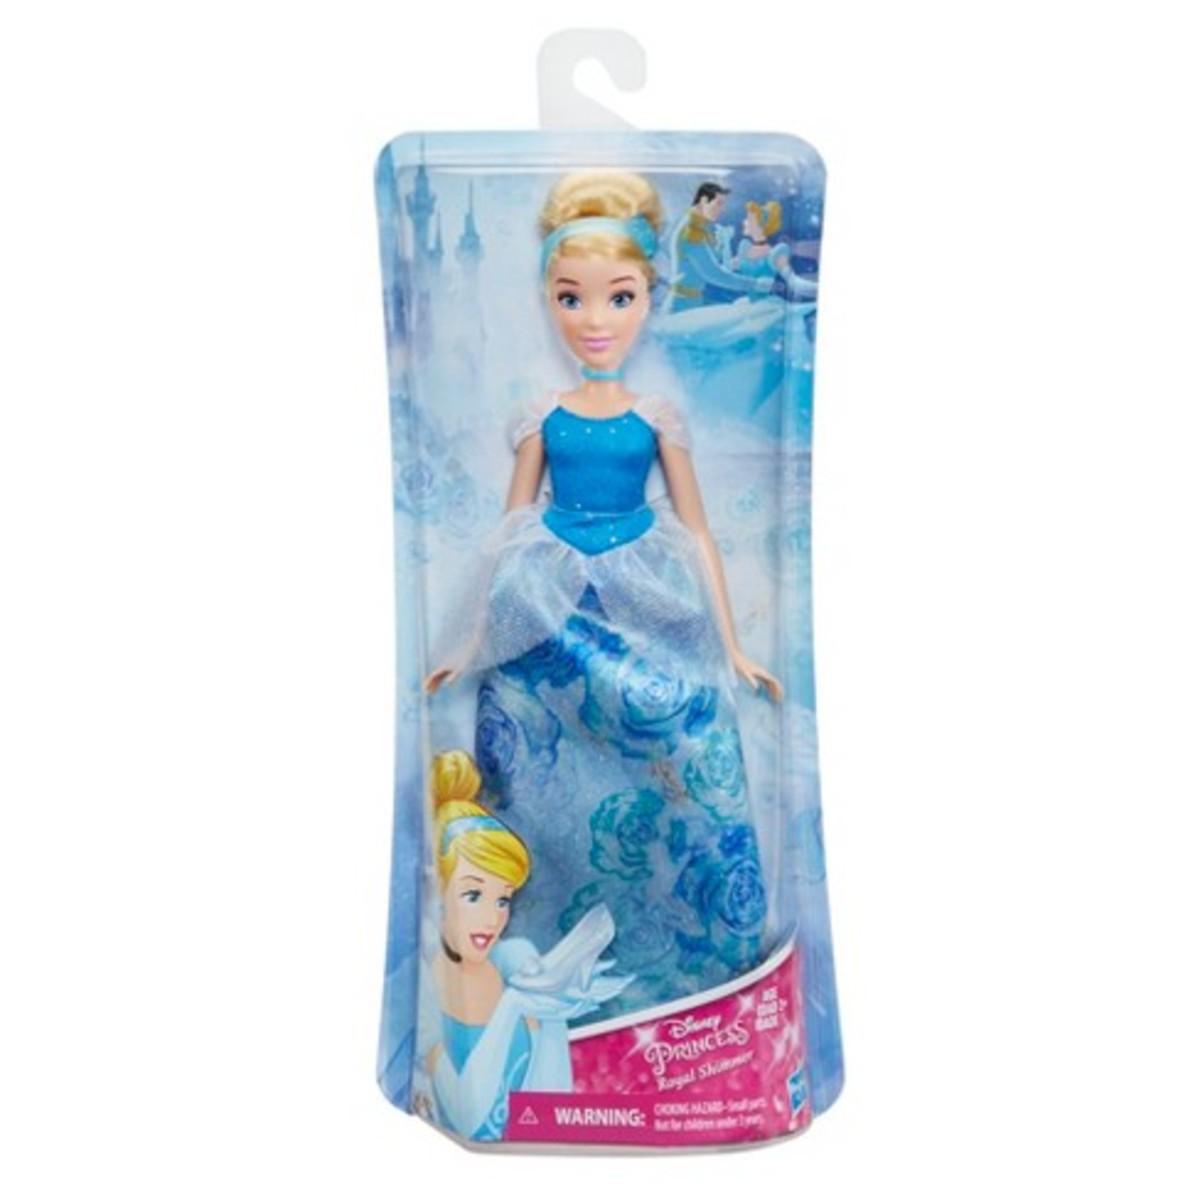 Disney Princess Cinderella Royal Shimmer Fashion